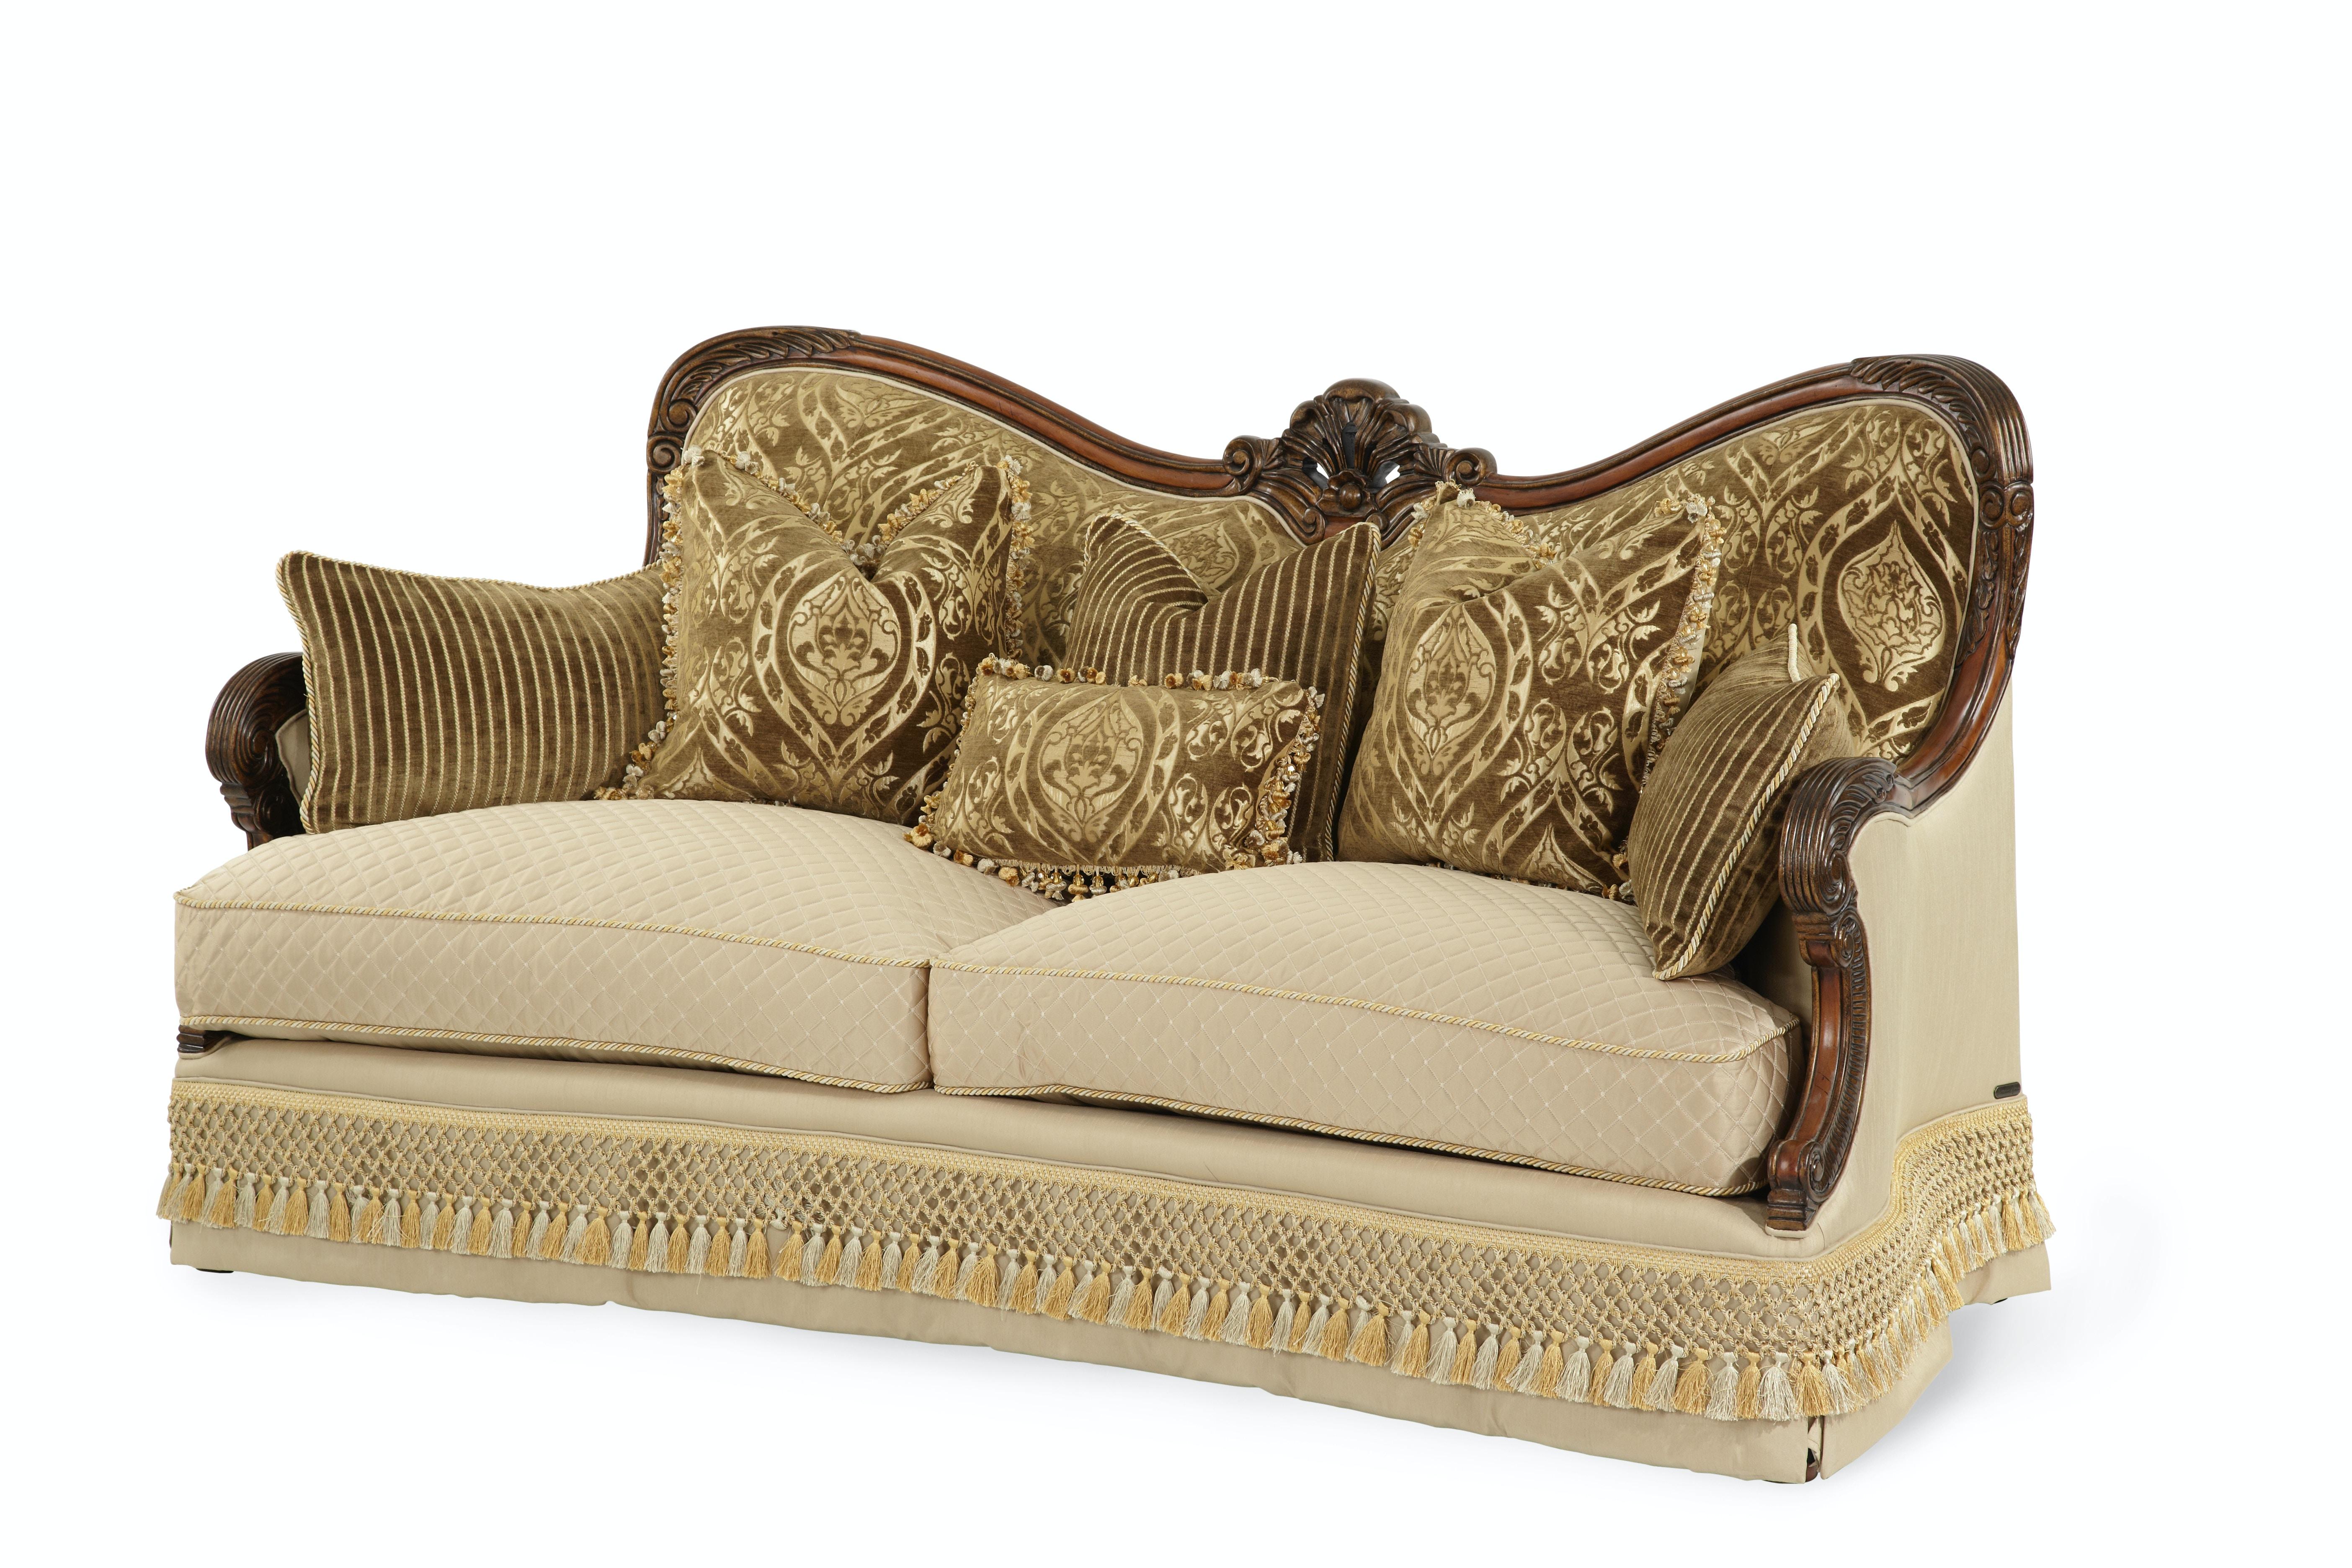 aico furniture chateau beauvais op1 wood trim sofa